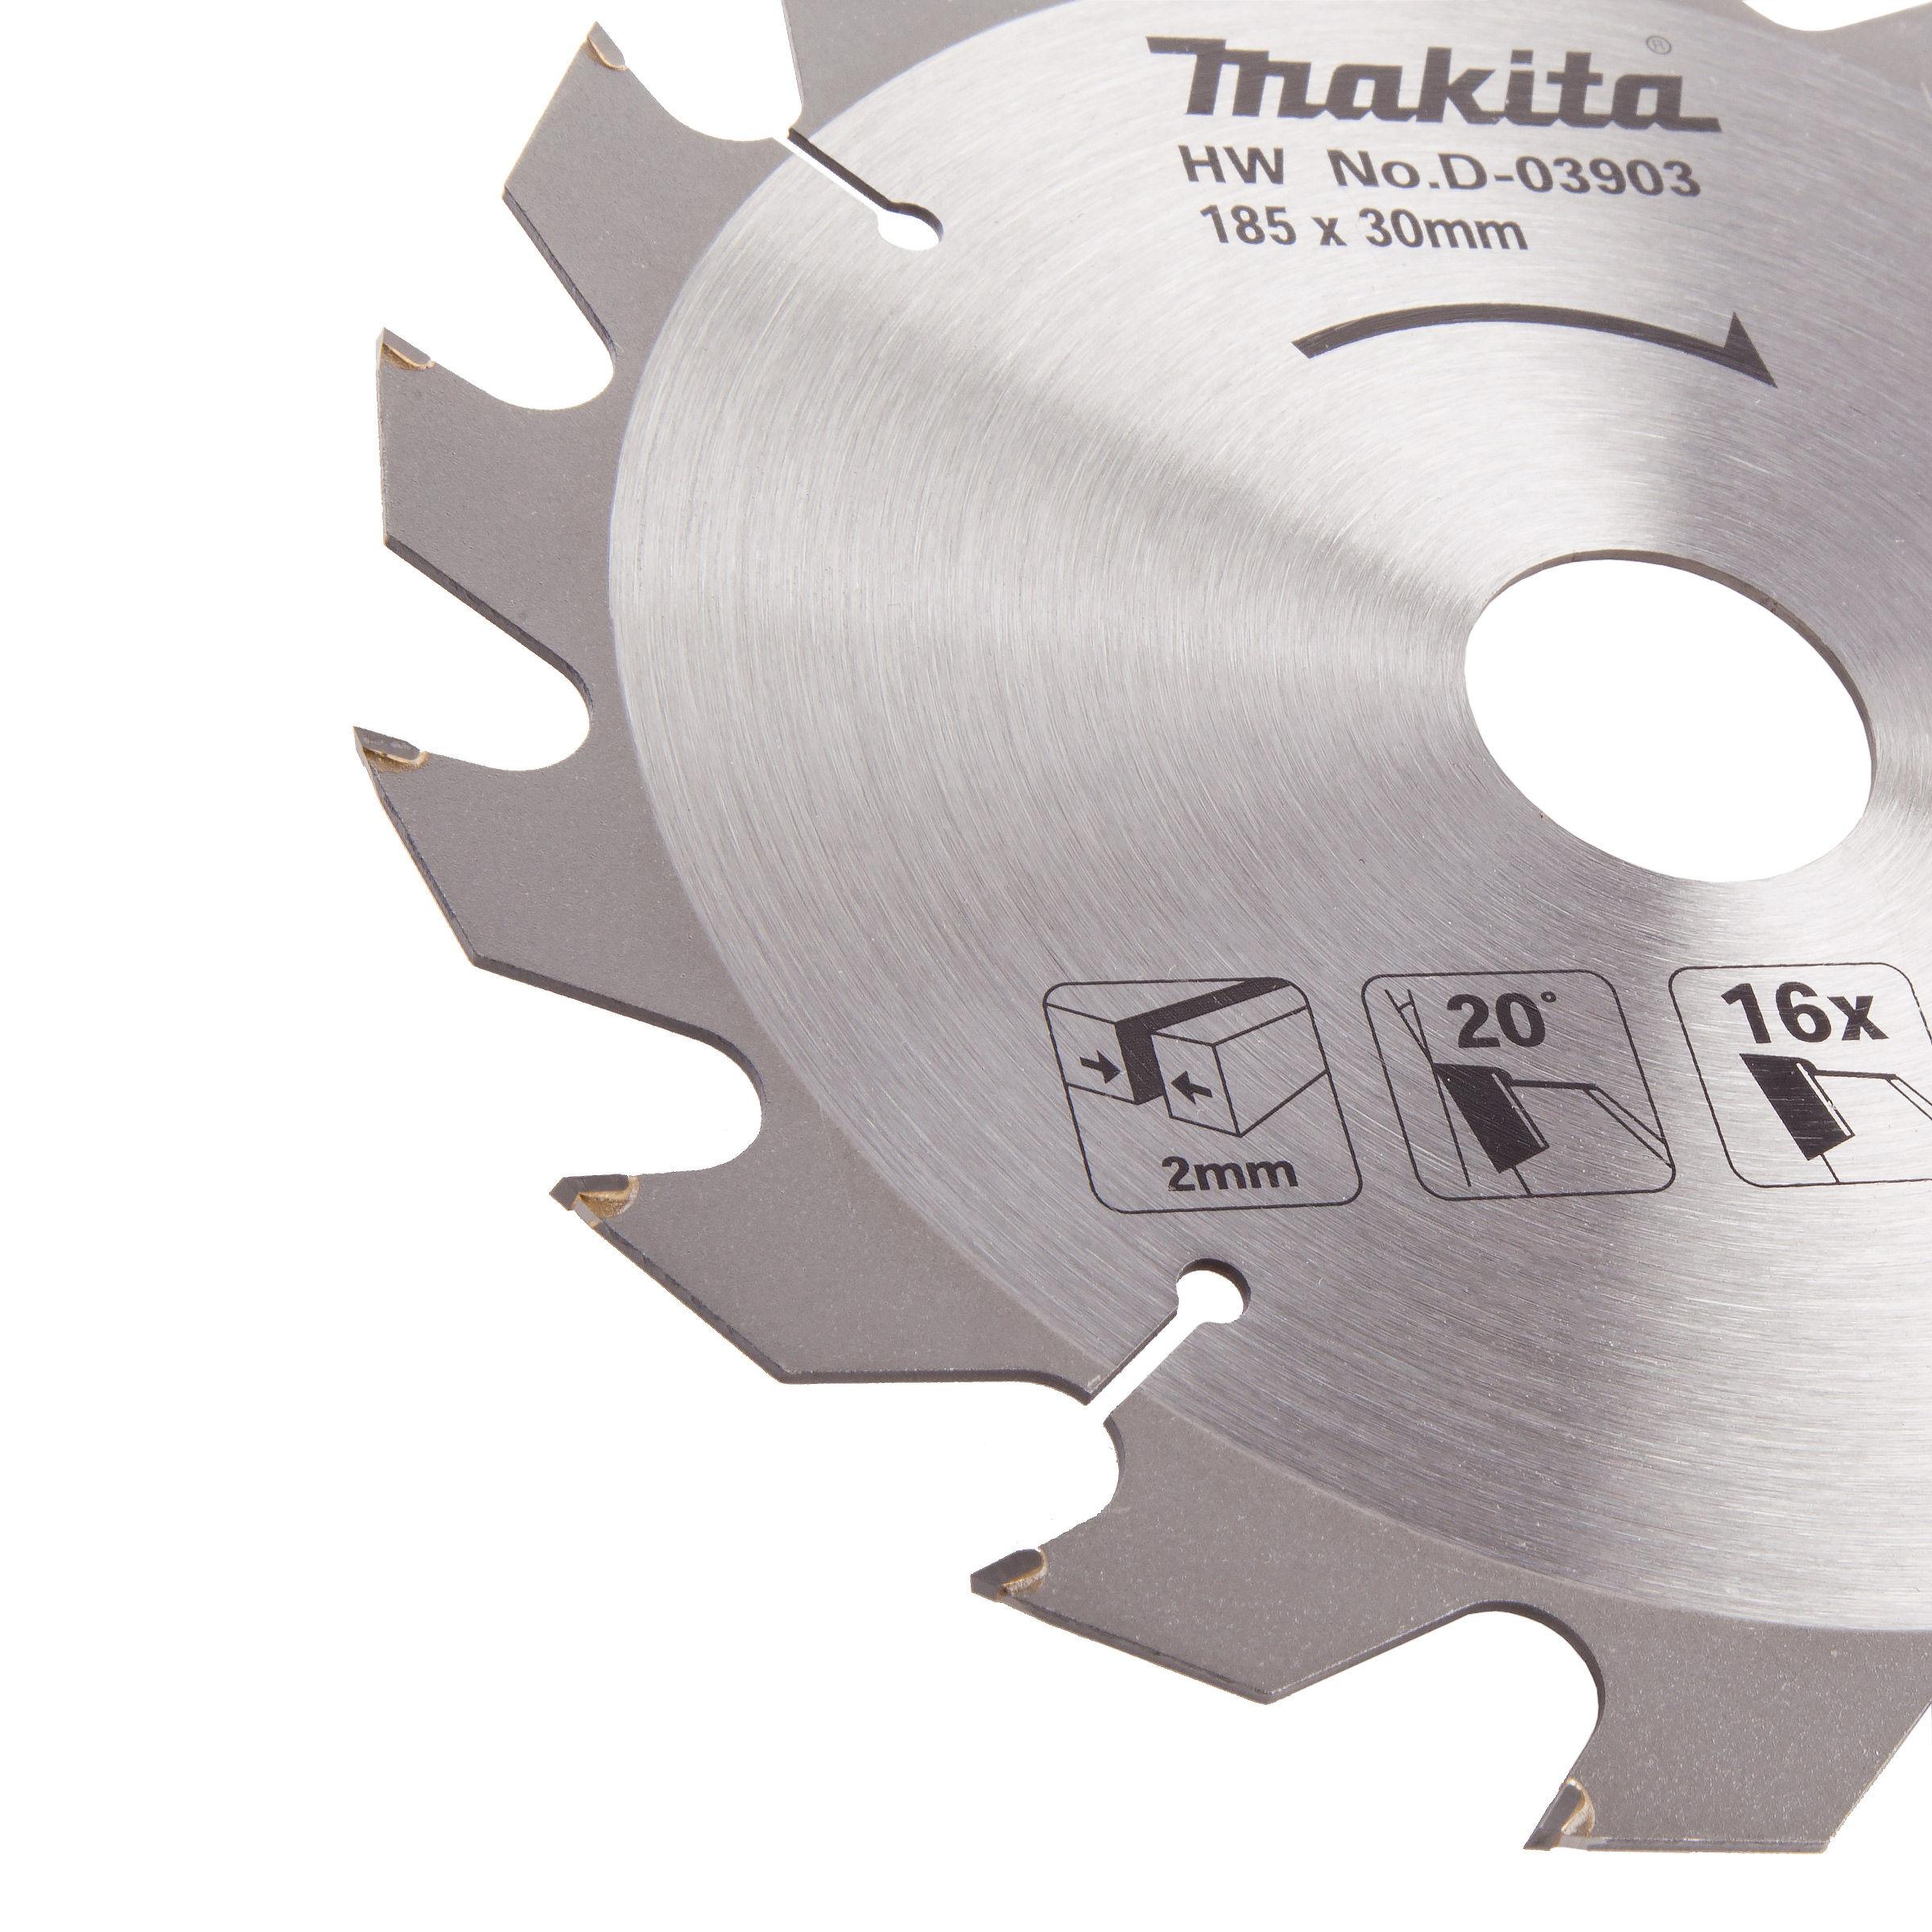 Toolstop makita d 03903 circular saw blade for wood 185 x 30 x 16 teeth makita d 03903 circular saw blade for wood 185 x 30 x 16 teeth greentooth Gallery